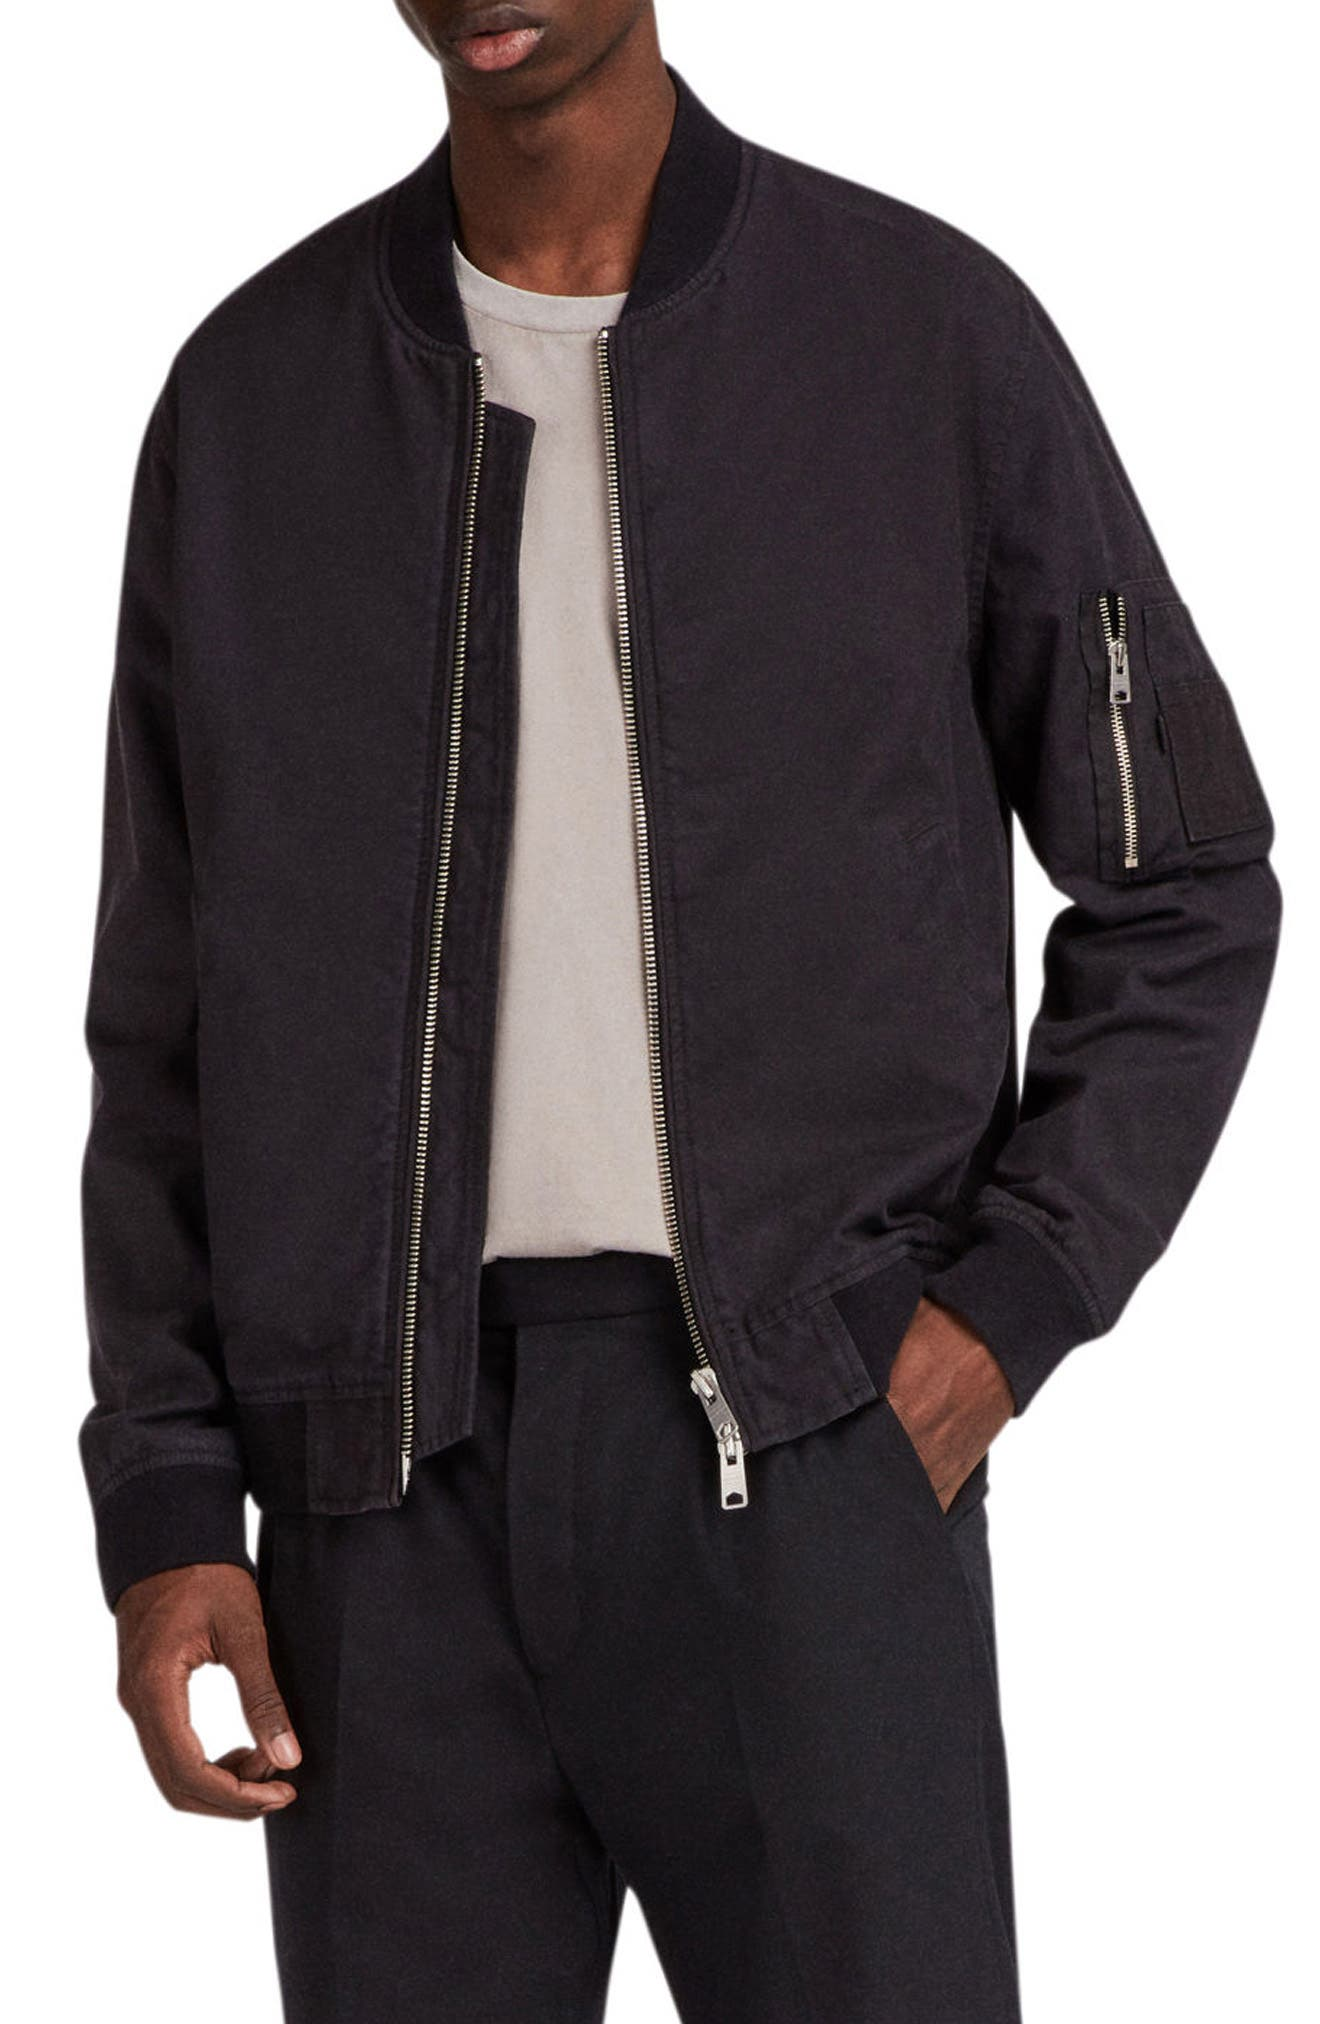 Moyne Bomber Jacket,                             Main thumbnail 1, color,                             Black